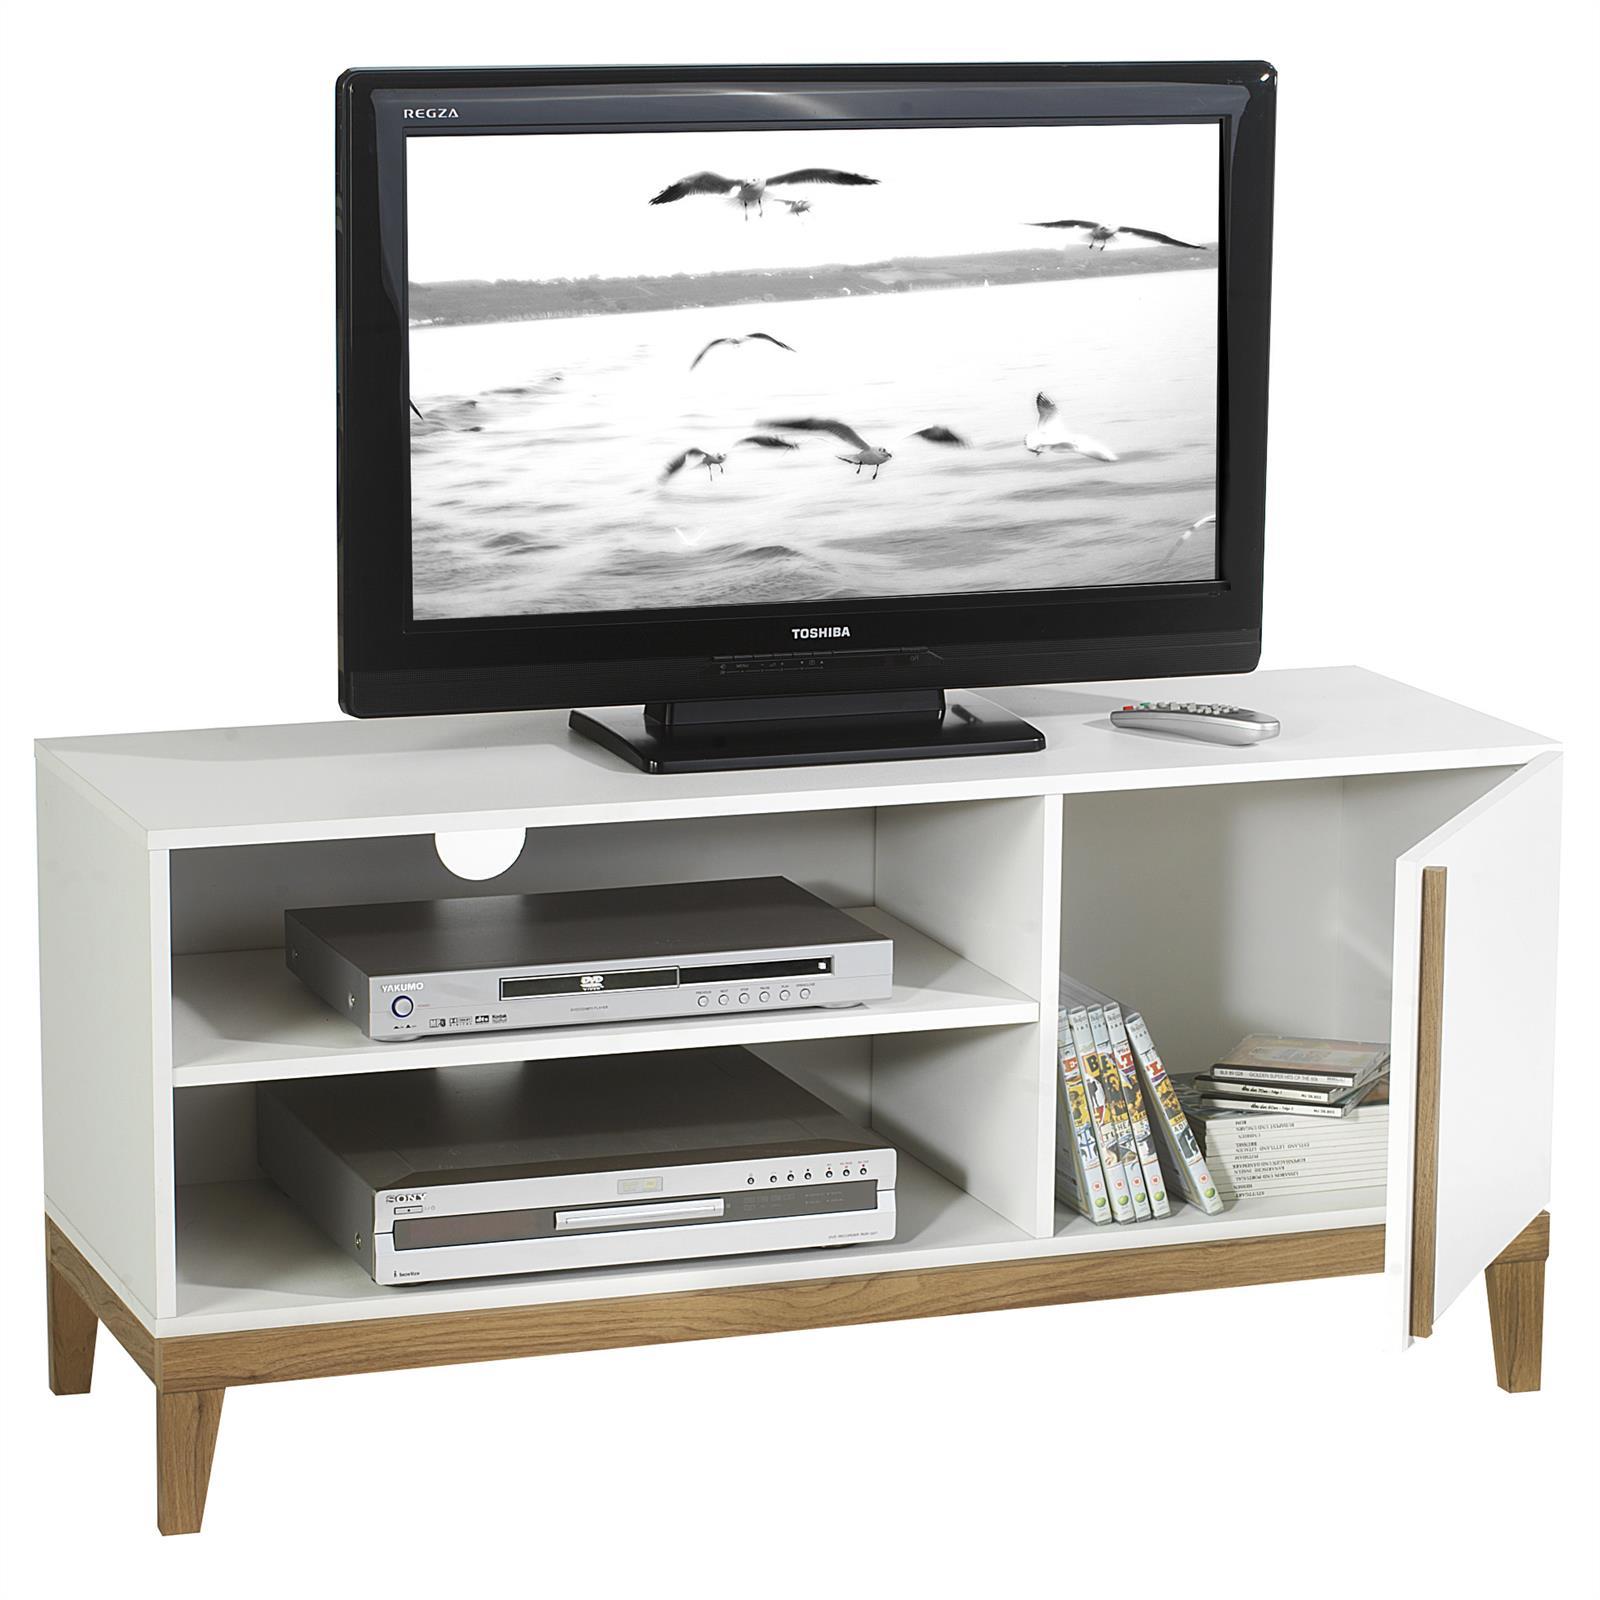 Meuble tv riga 2 niches 1 porte blanc et bois mobil for Meuble tv banc bois